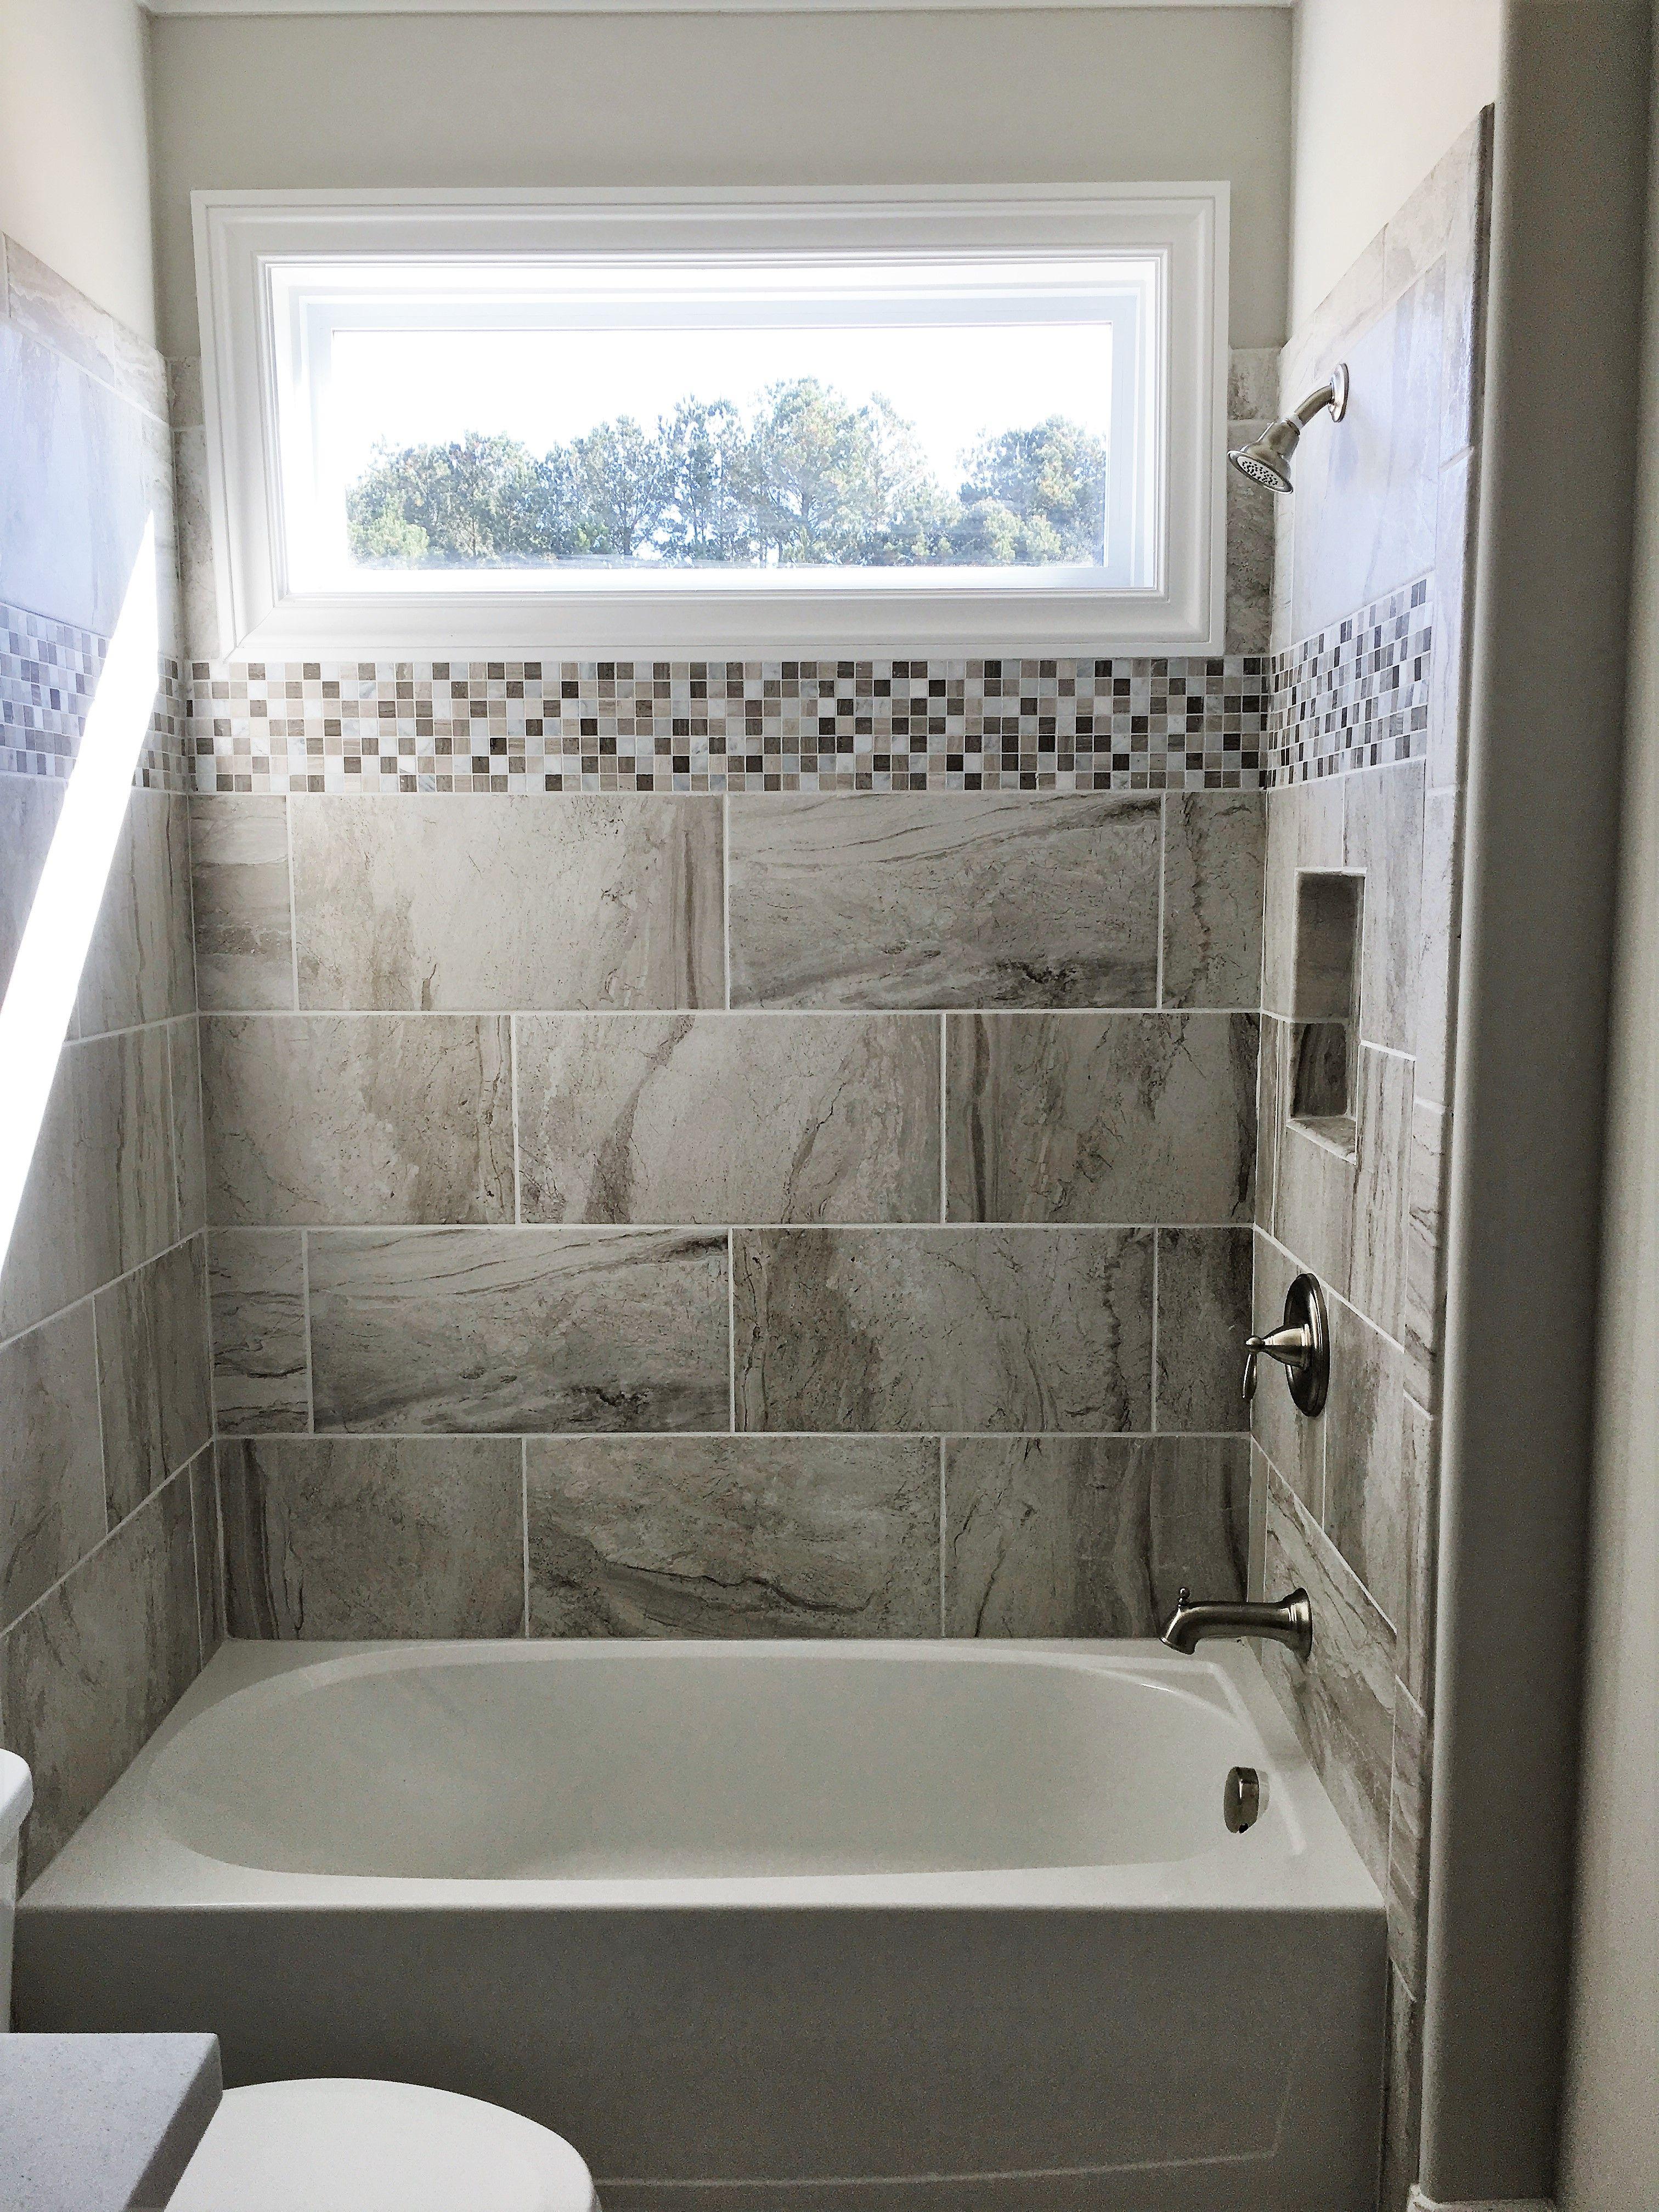 12x24 Amalfi Stone Bianco Scala Tile Installed Horizontally On A Brick Pattern Black And White Tiles Bathroom Rustic Bathroom Designs Rustic Bathroom Shelves